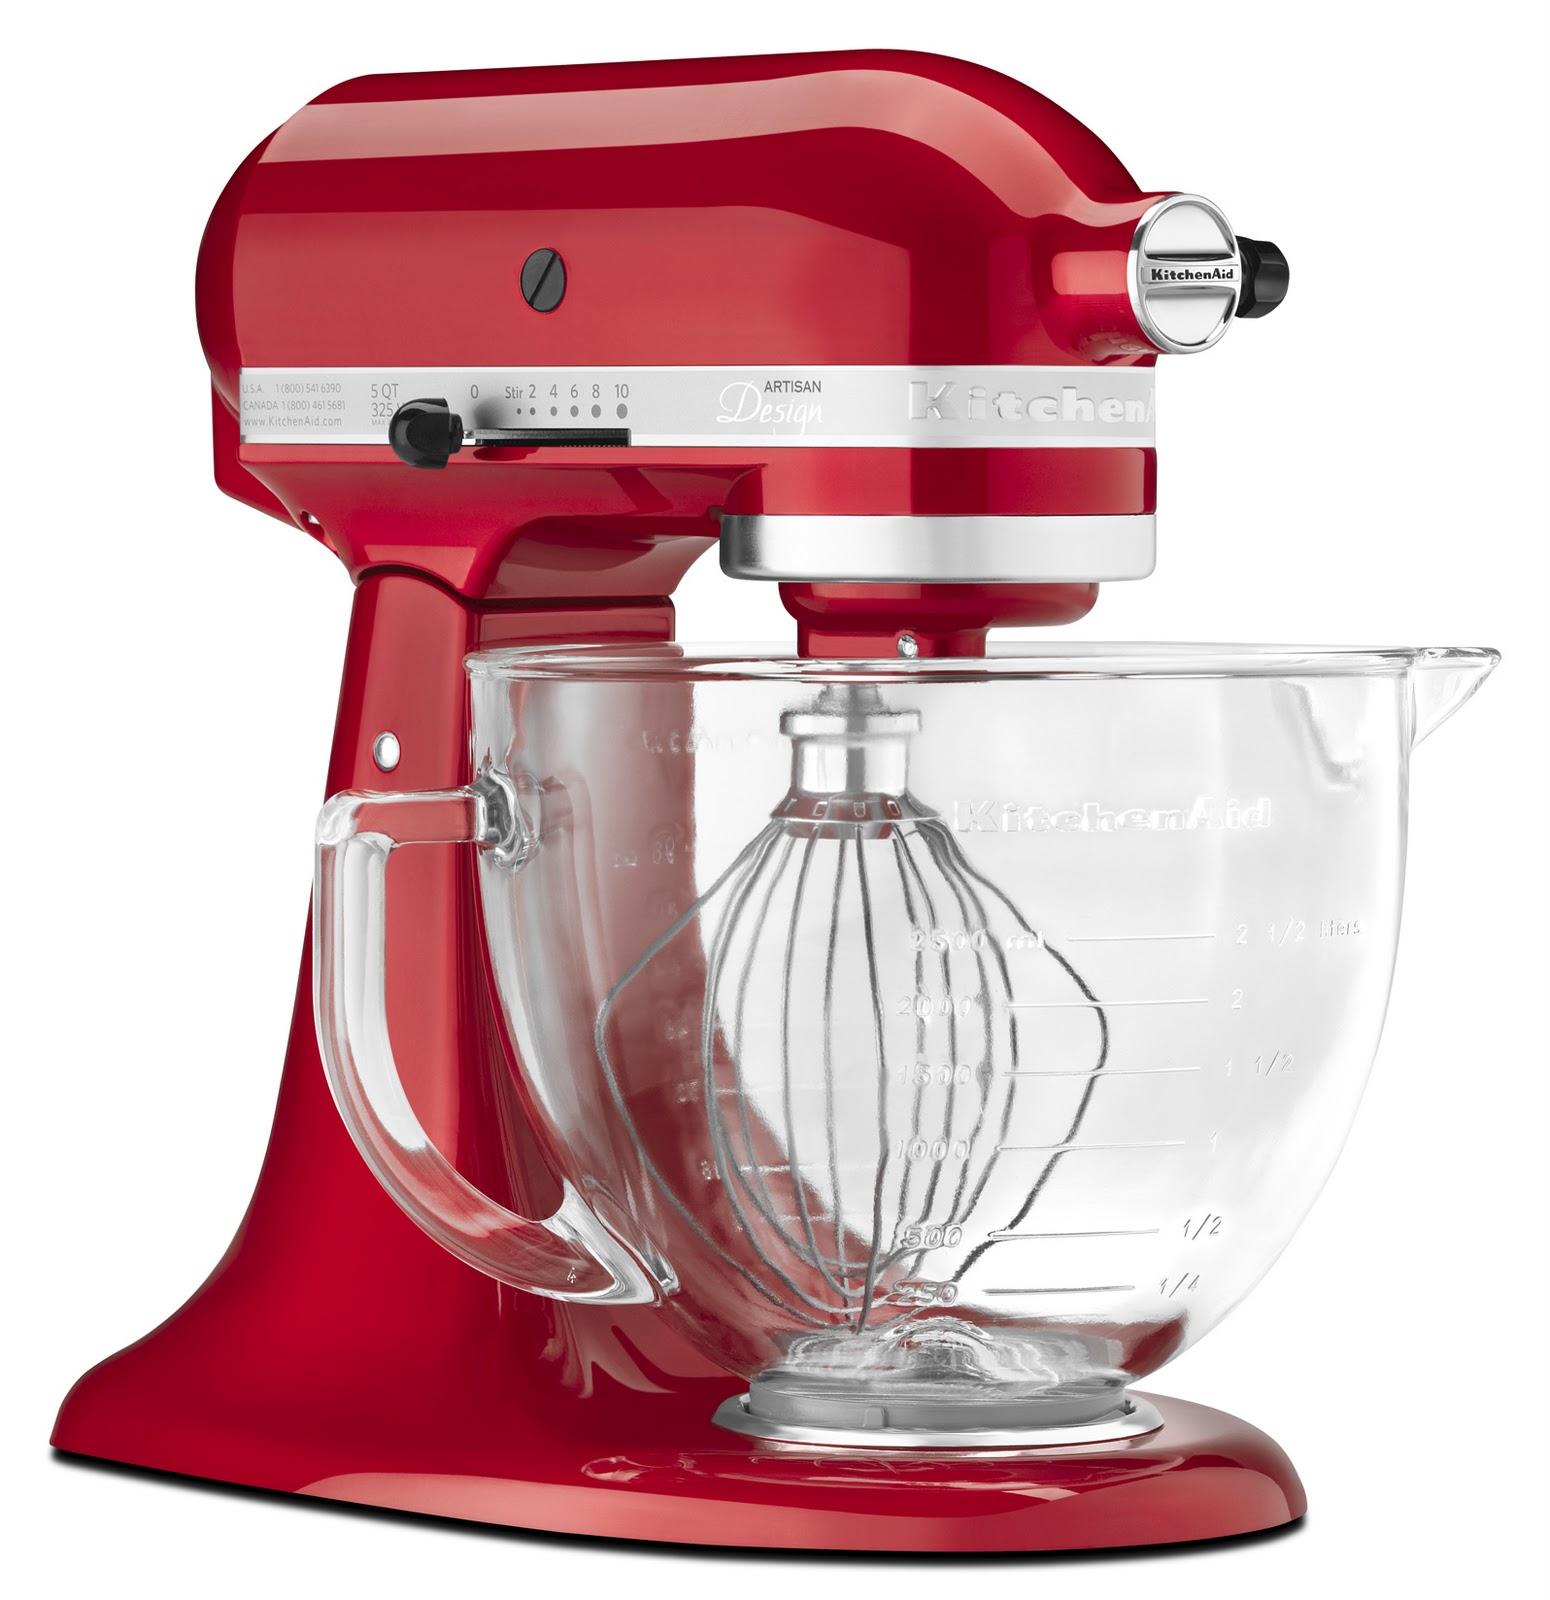 Red kitchenaid hand mixer photo - 3